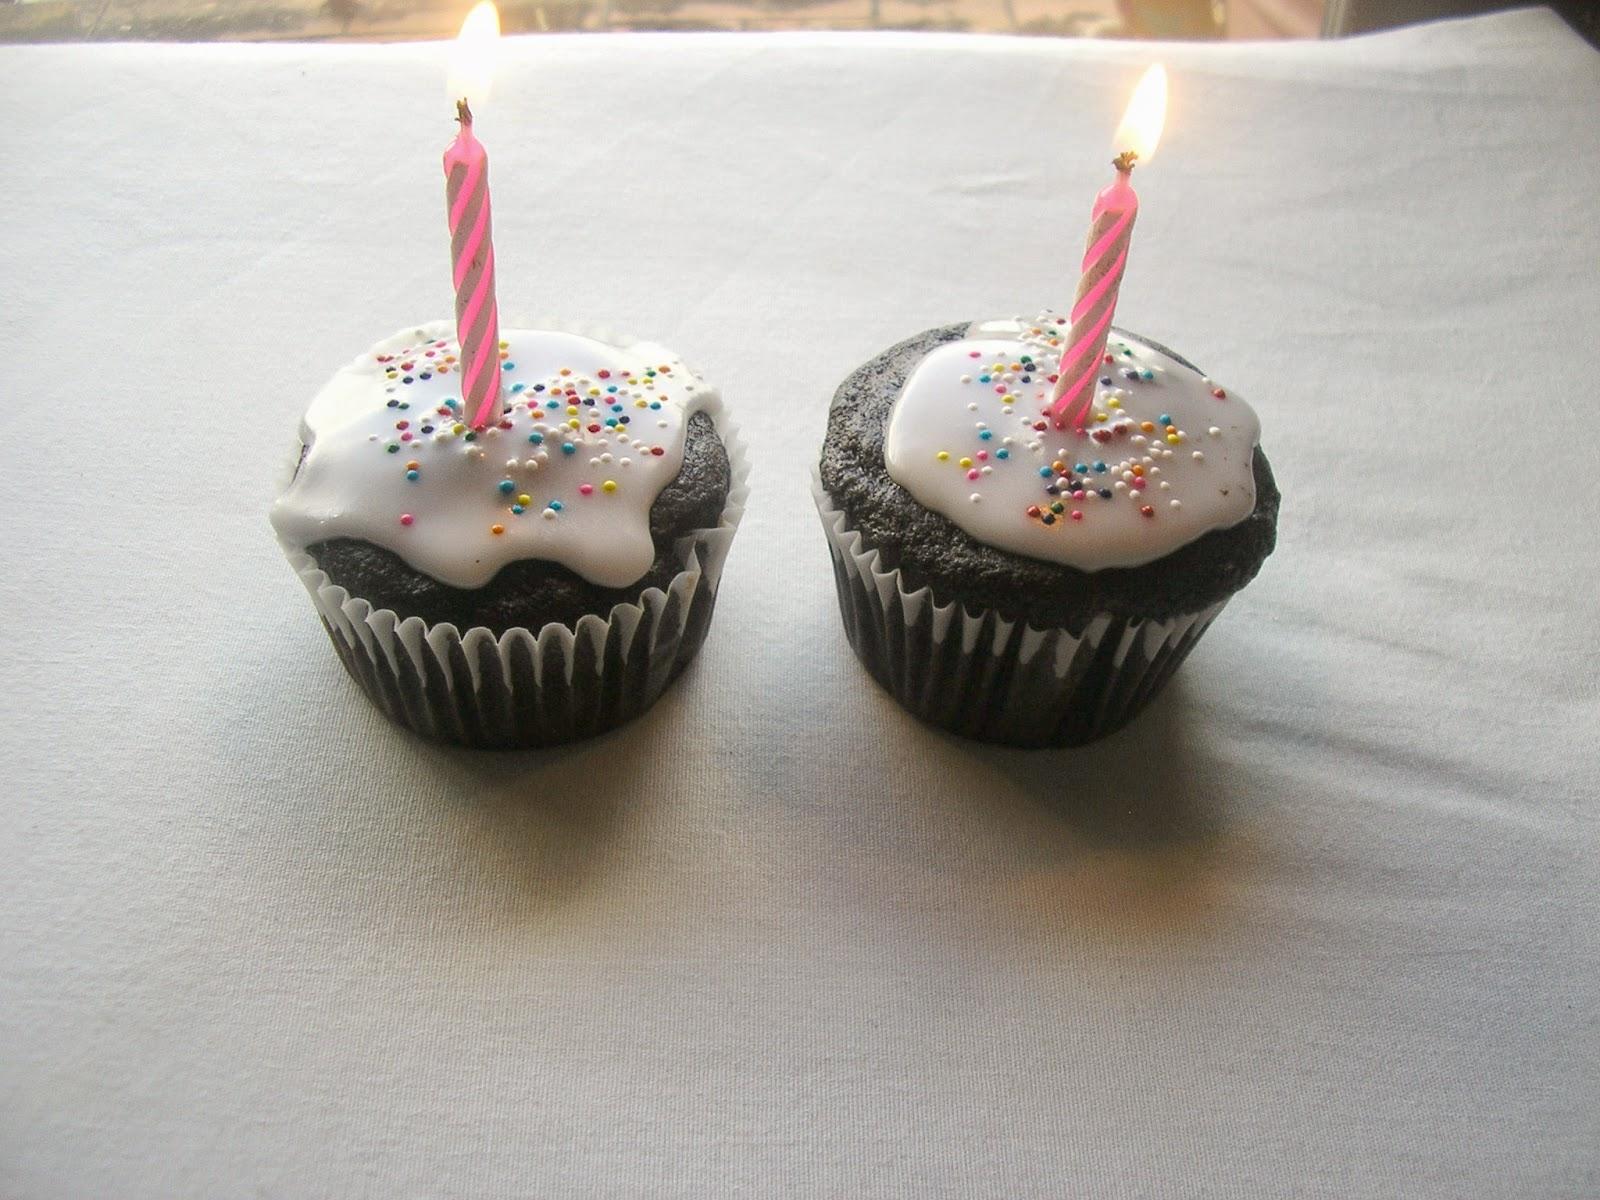 The Cobweb: Cupcakes And English Muffins